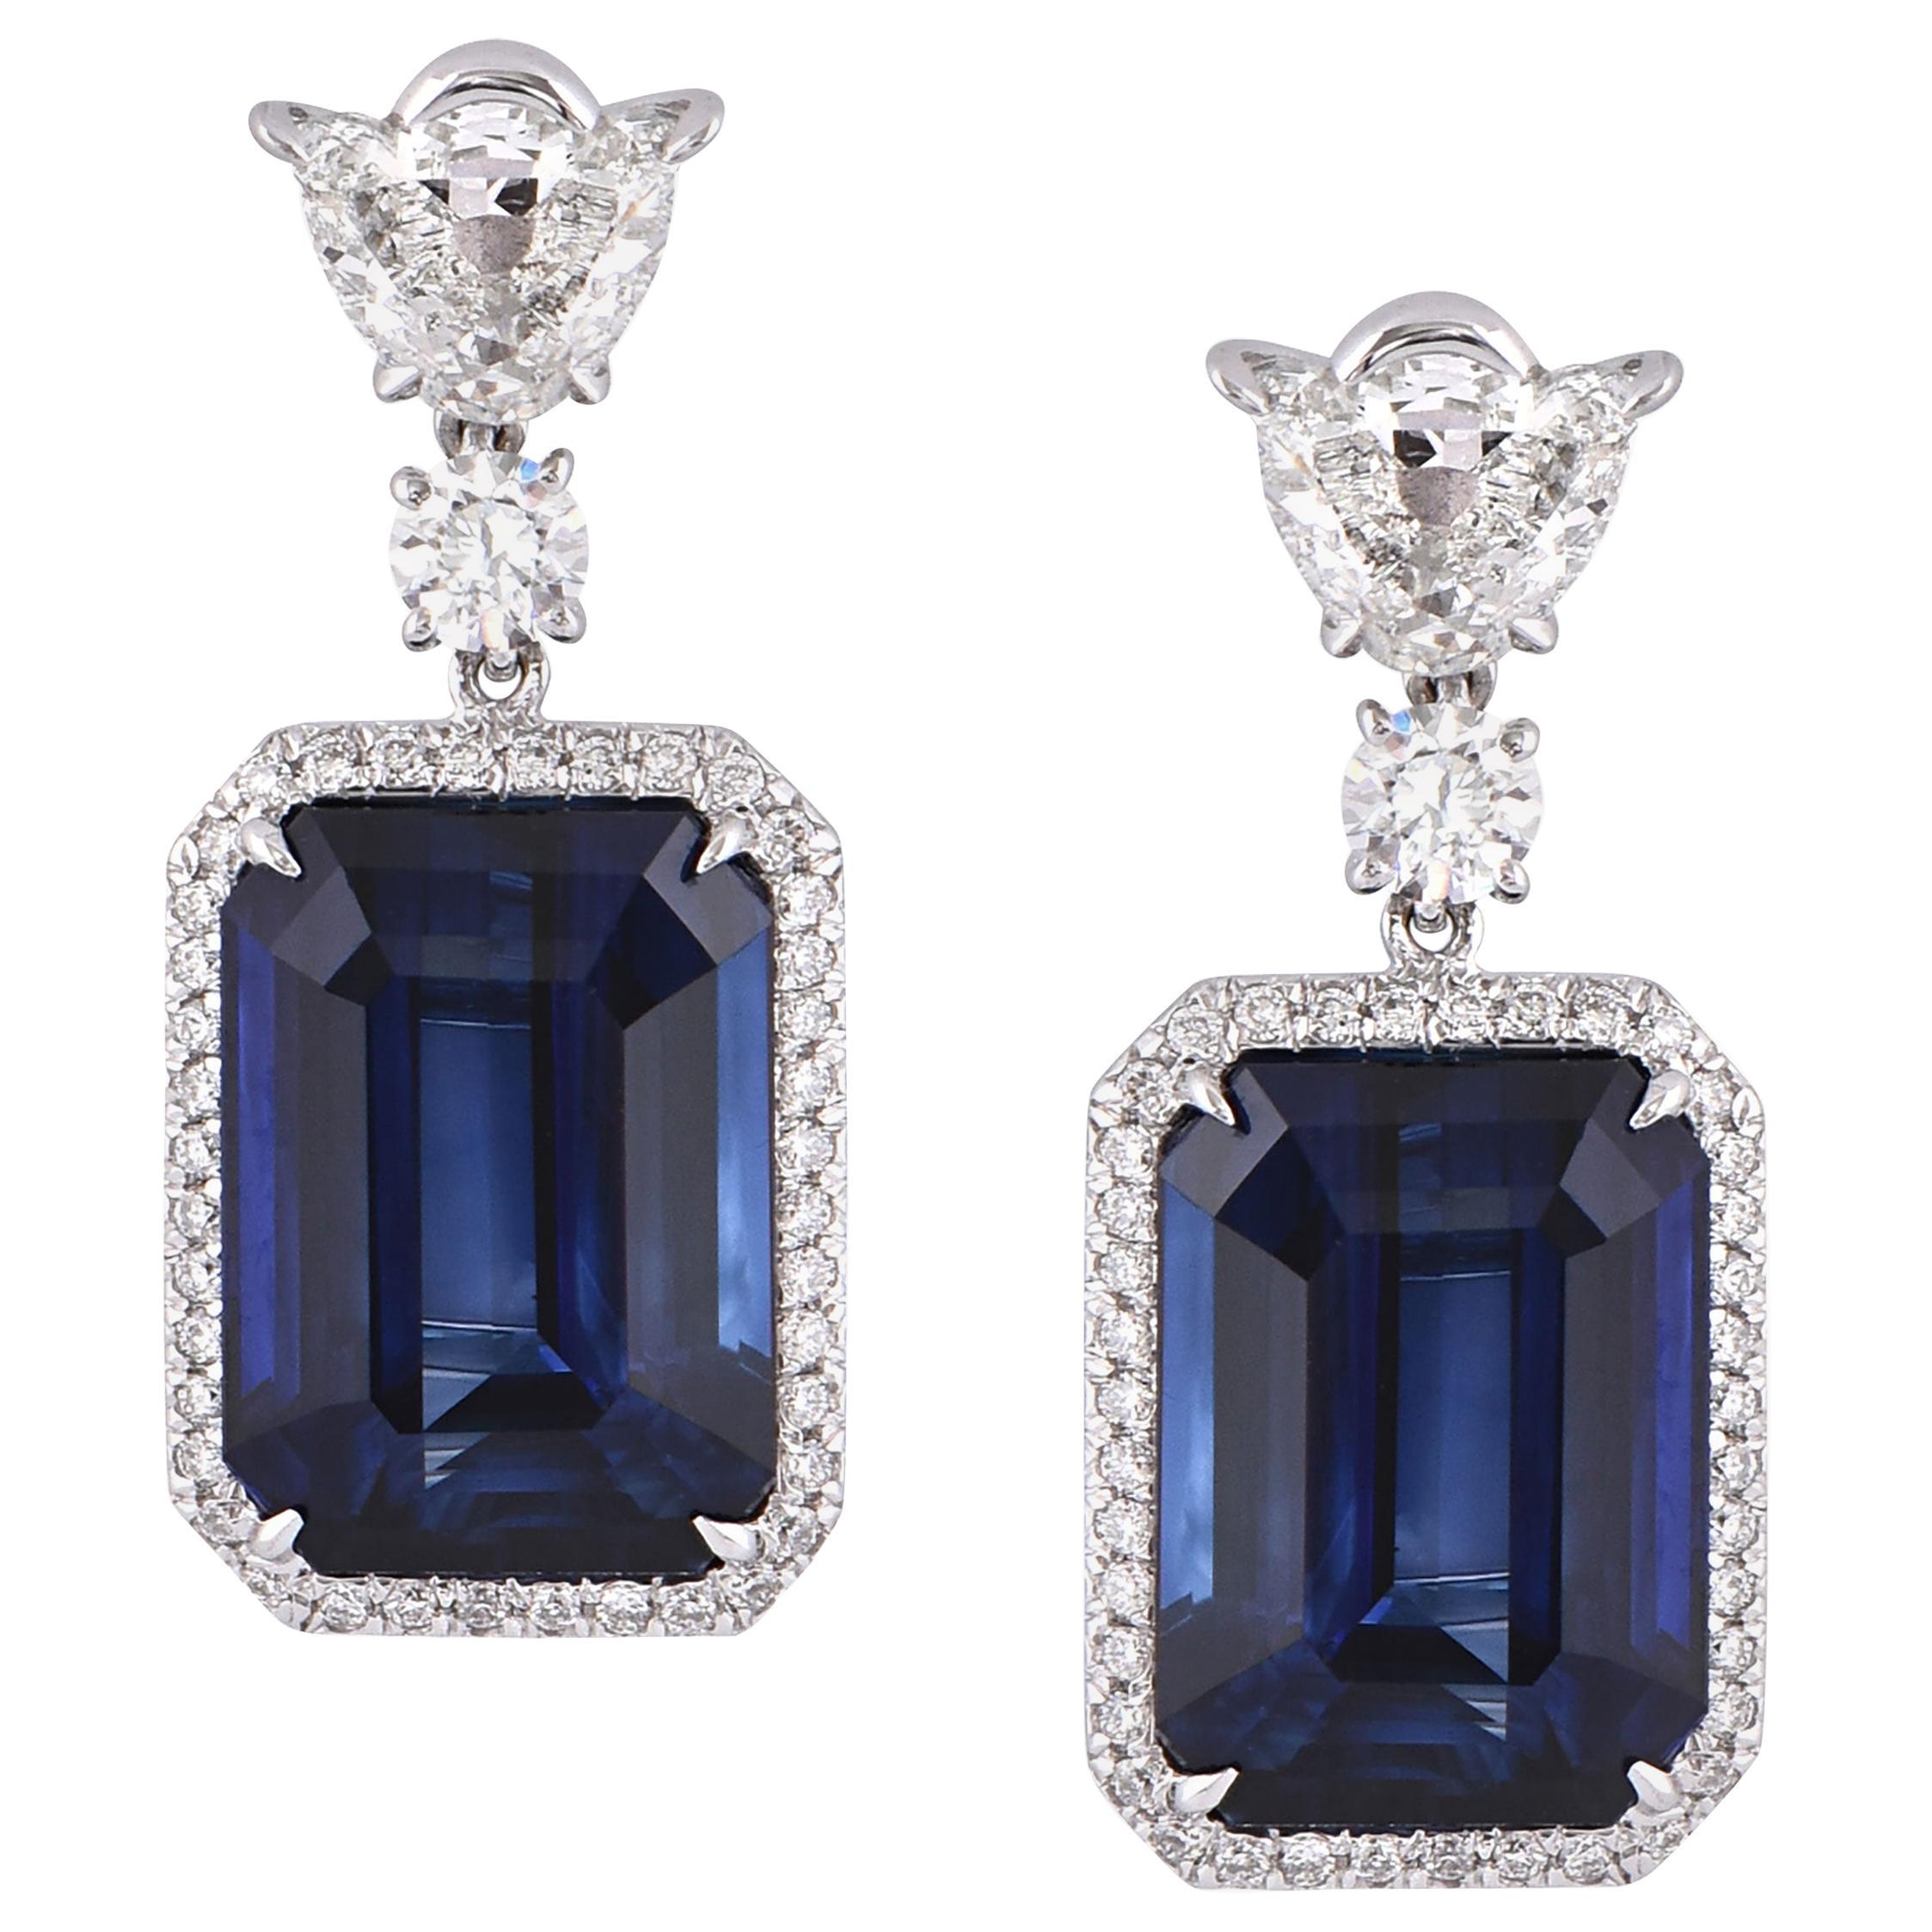 Laviere 15.97 Carat Blue Sapphire and Diamond Earrings